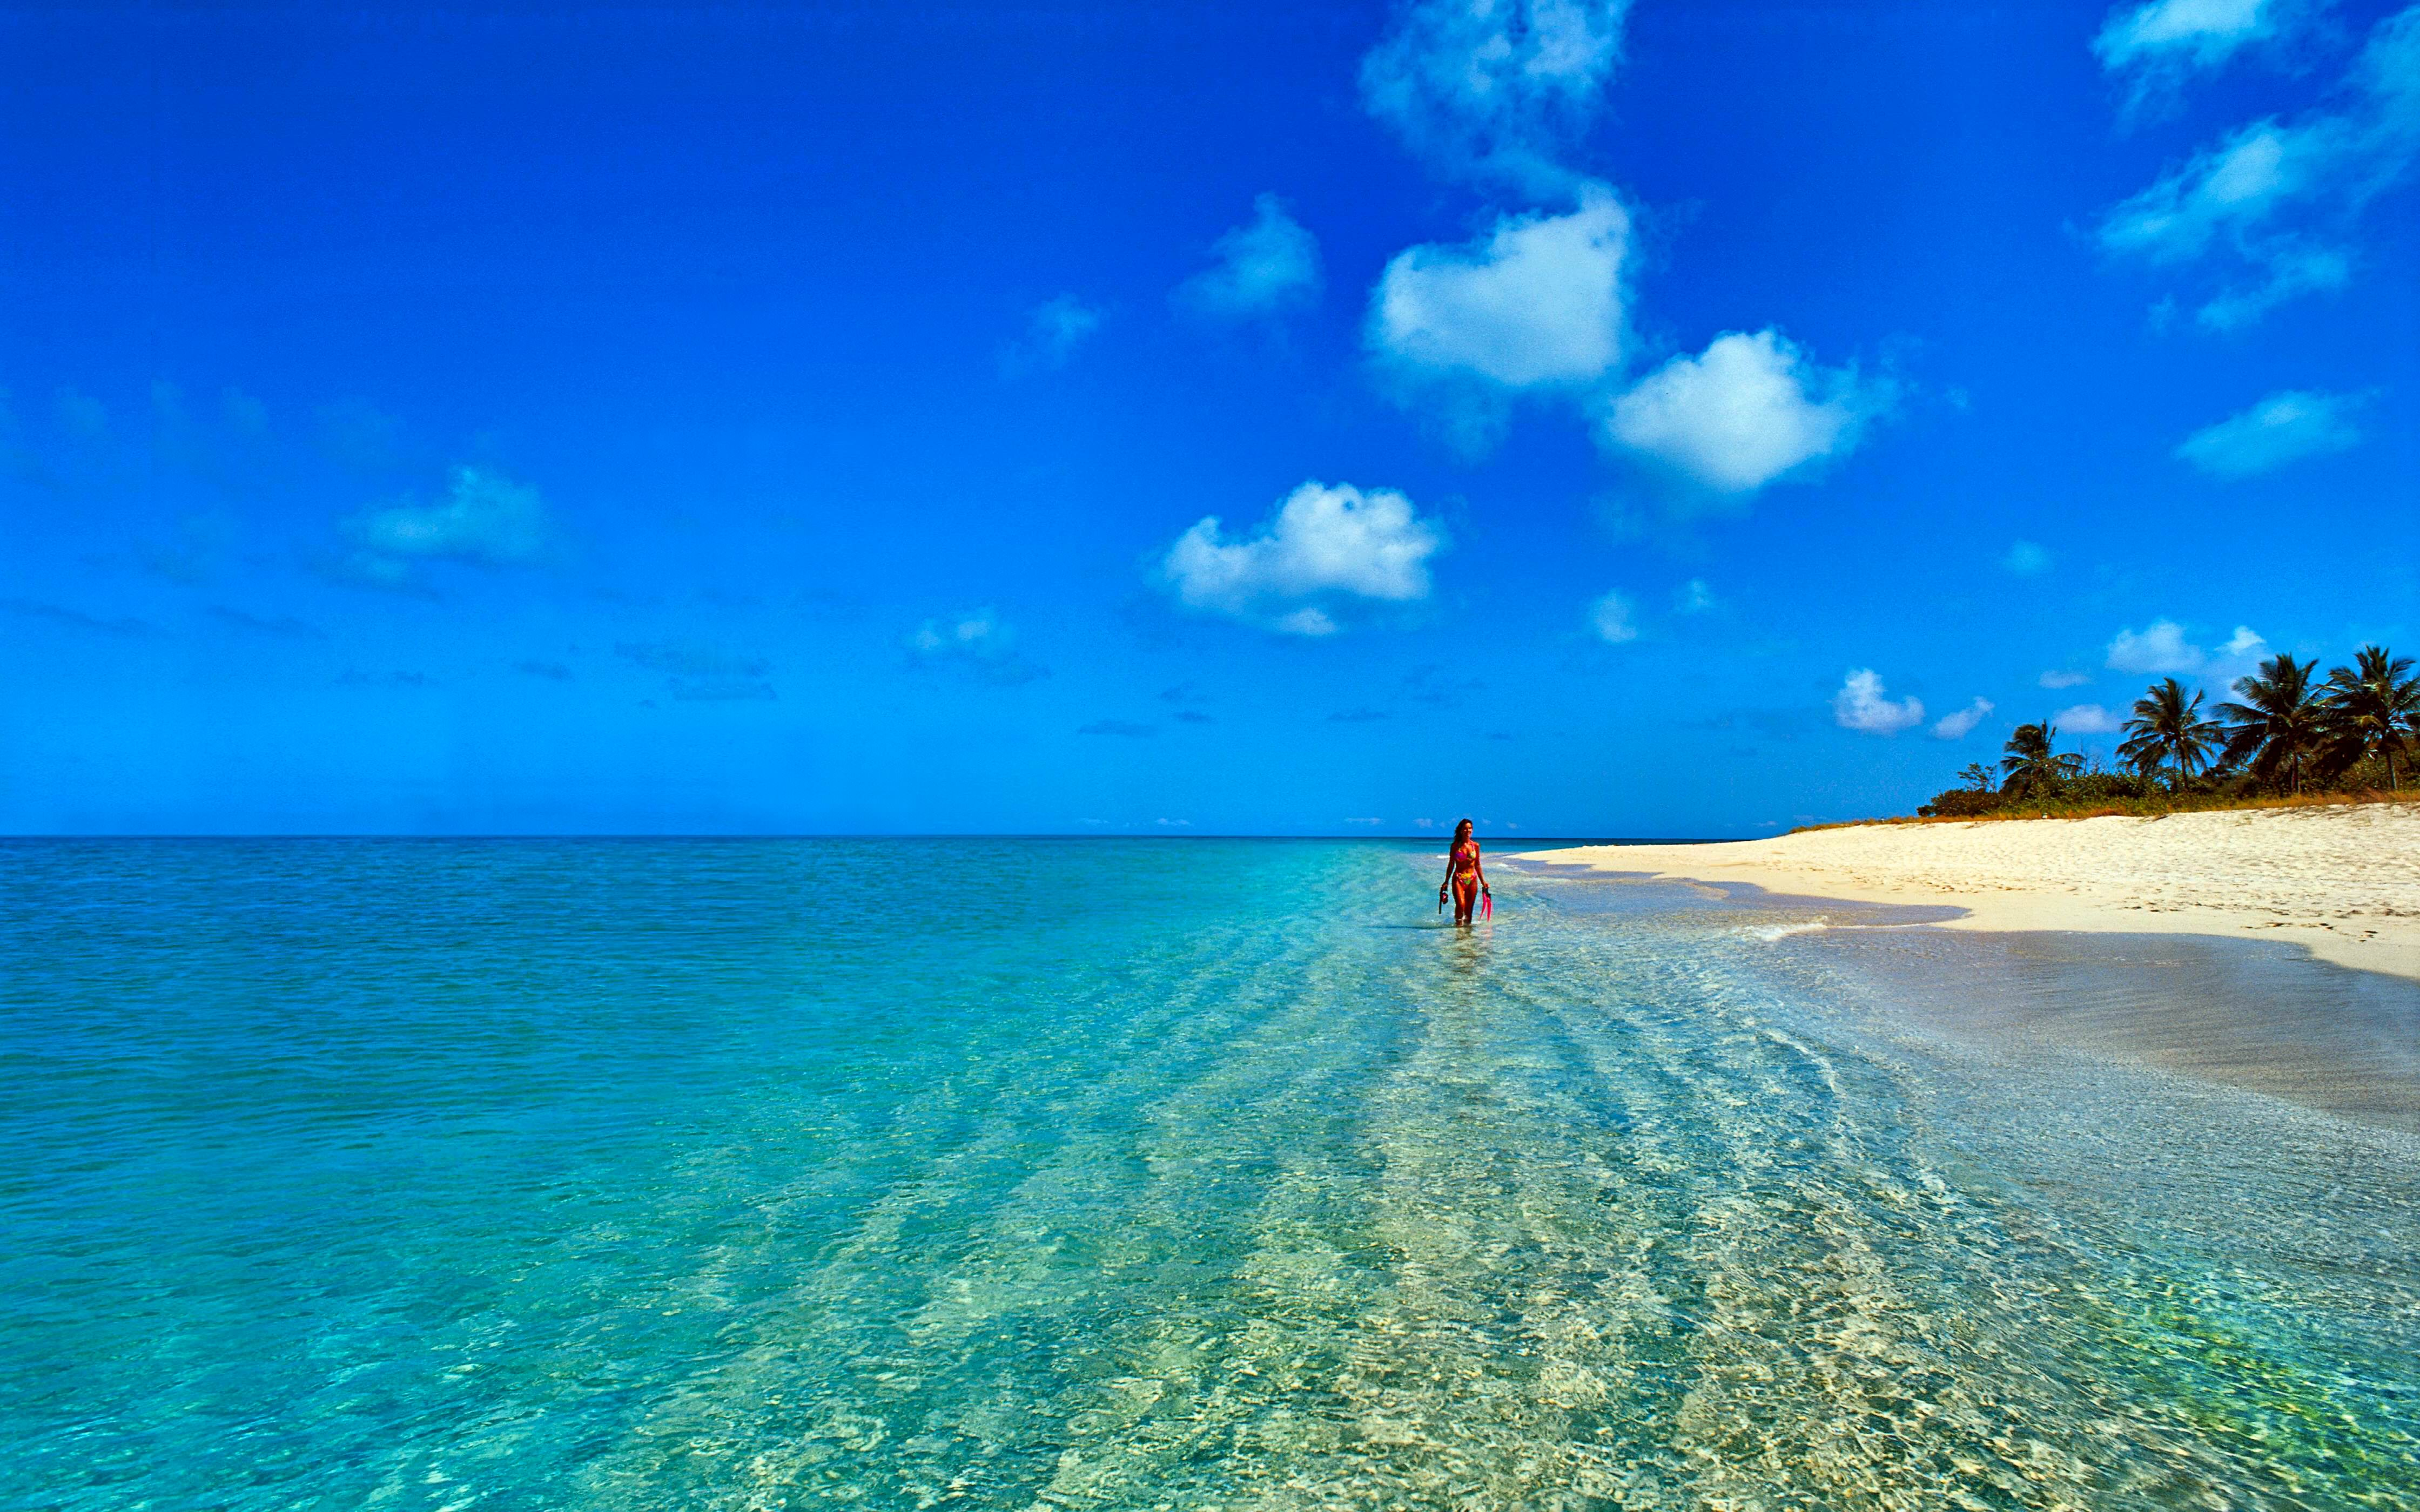 Beautiful ocean views beaches are mistaken